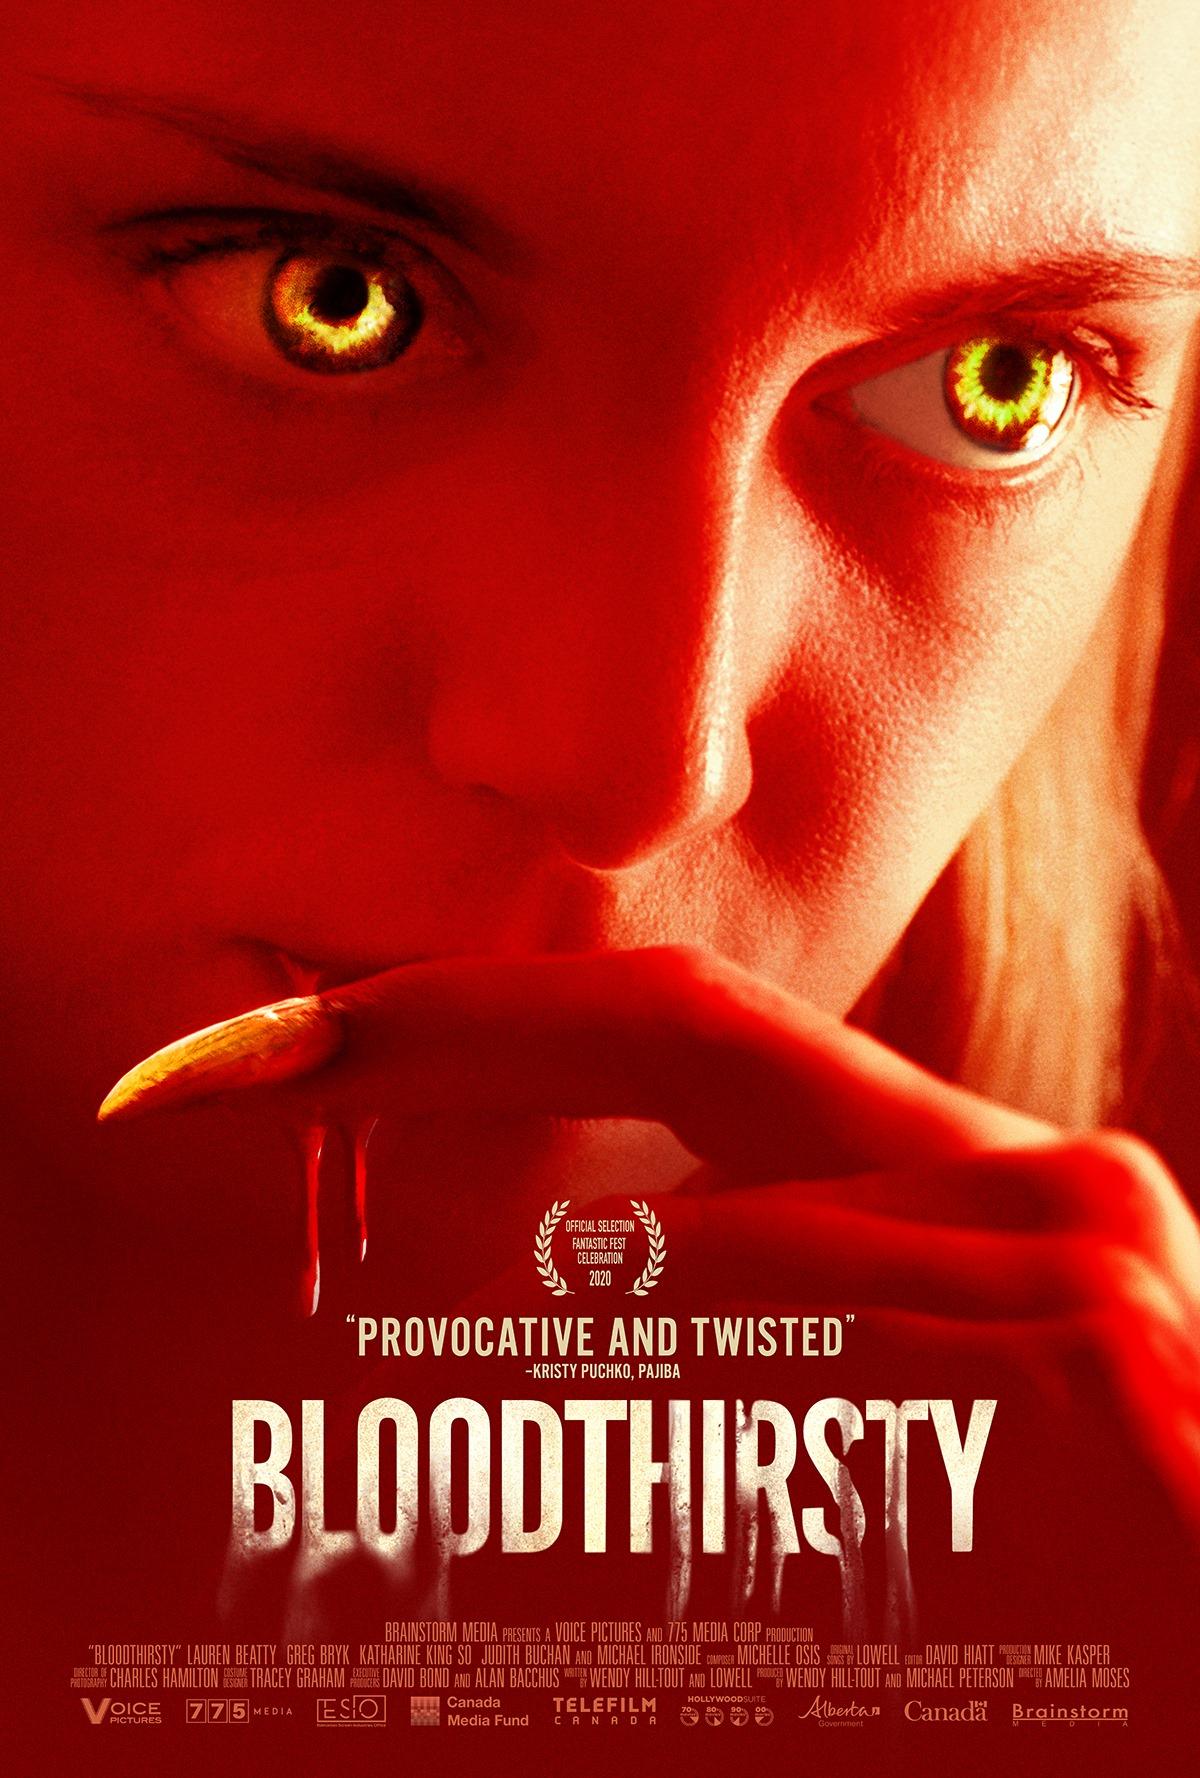 Bloodthirsty (2020) Telugu Dubbed (Voice Over) & English [Dual Audio] WebRip 720p [1XBET]